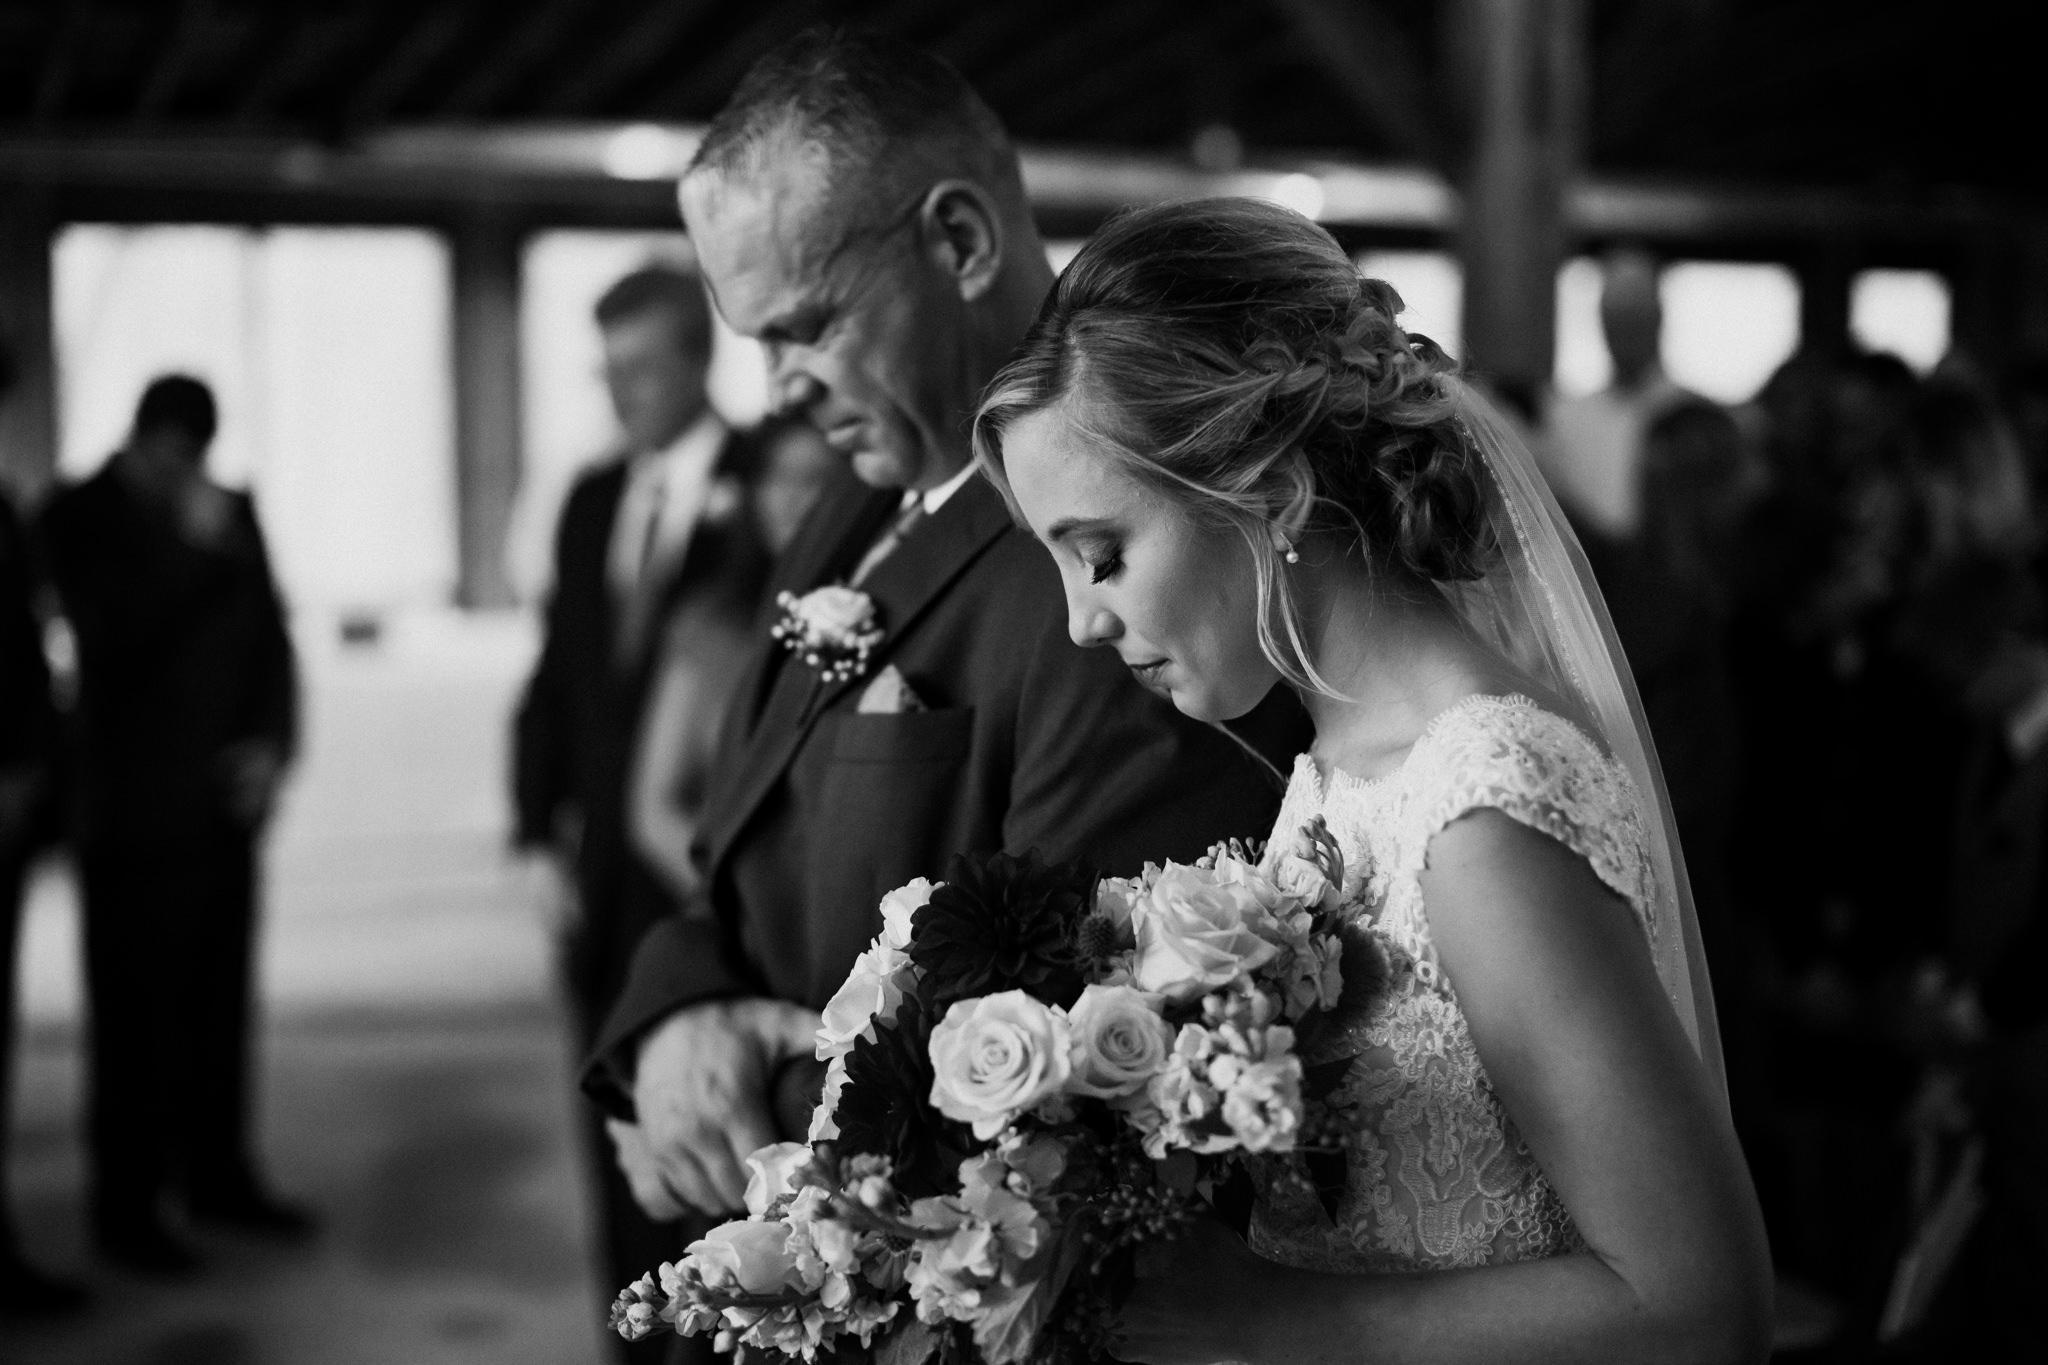 memphis-wedding-photographer-mallards-croft-wedding-venue-cassie-cook-photography-42.jpg